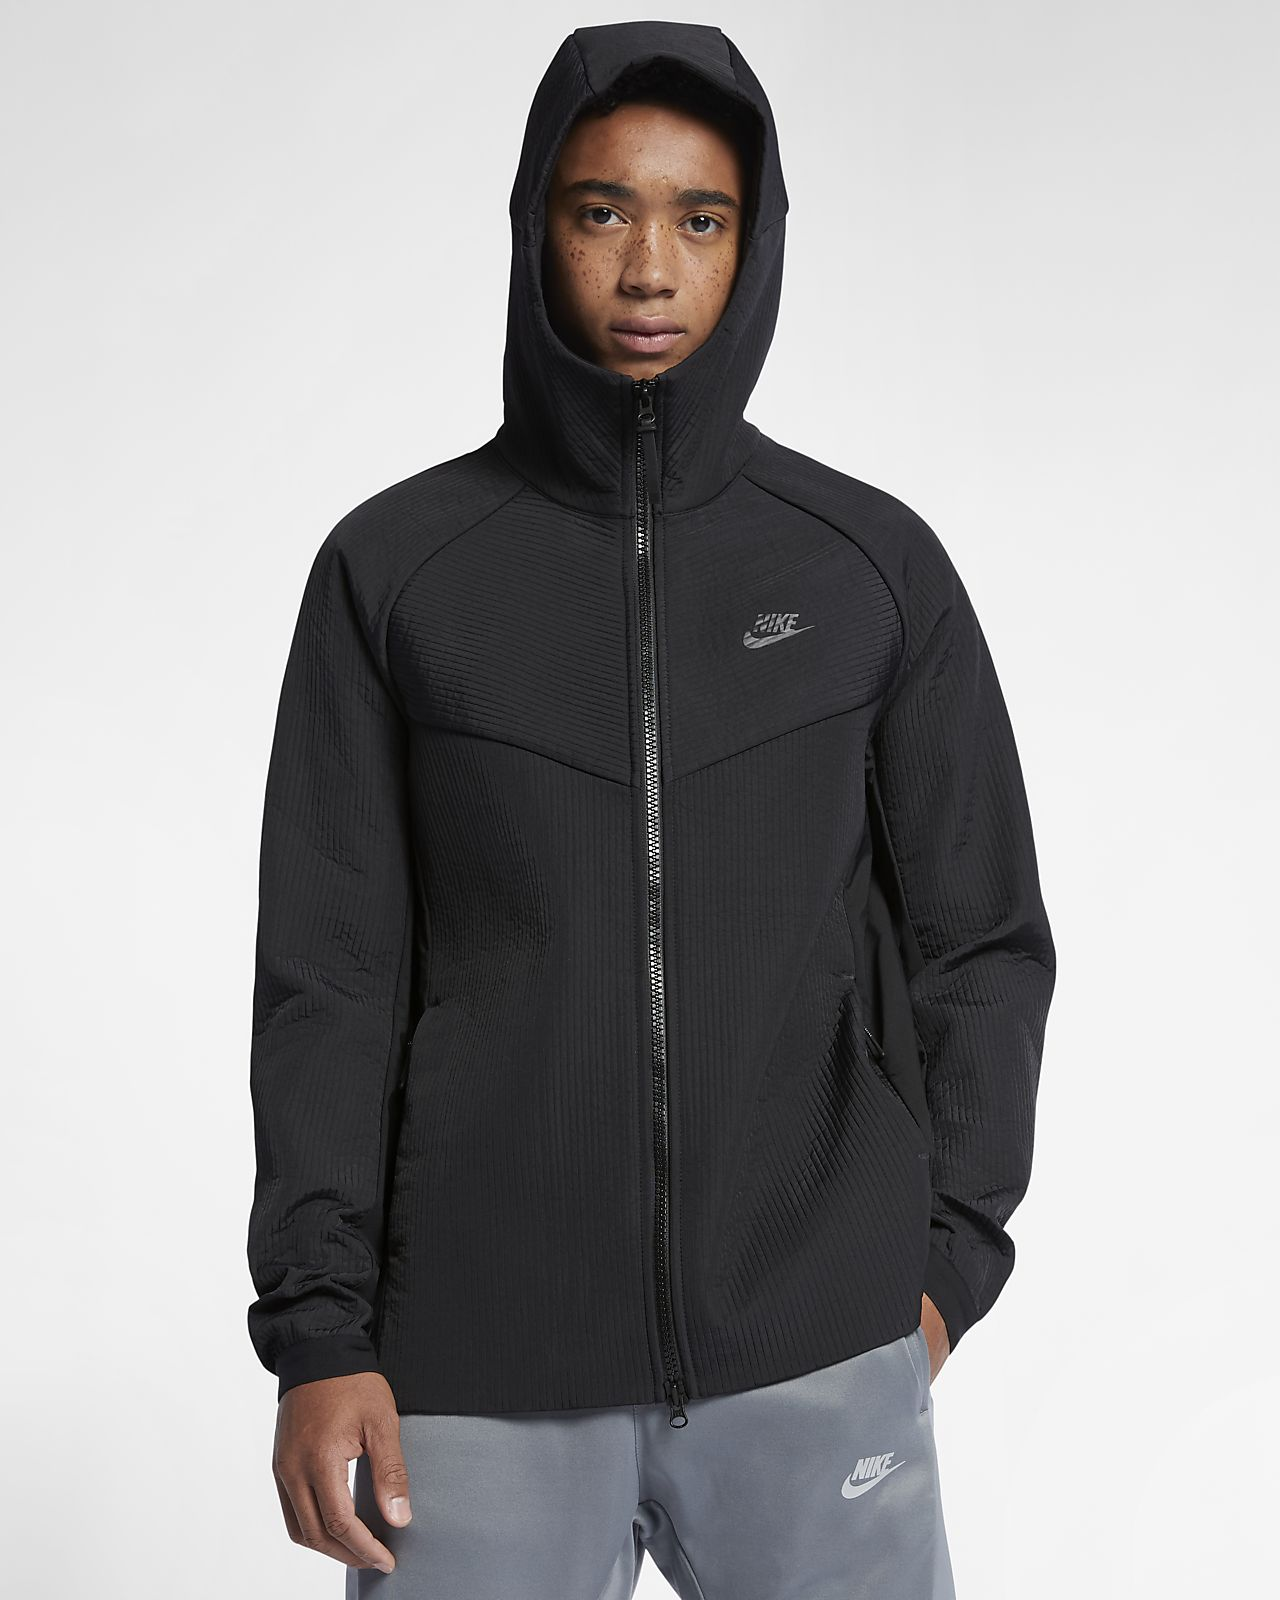 ac19450e0066 Nike Sportswear Tech Pack Men s Woven Jacket. Nike.com CA